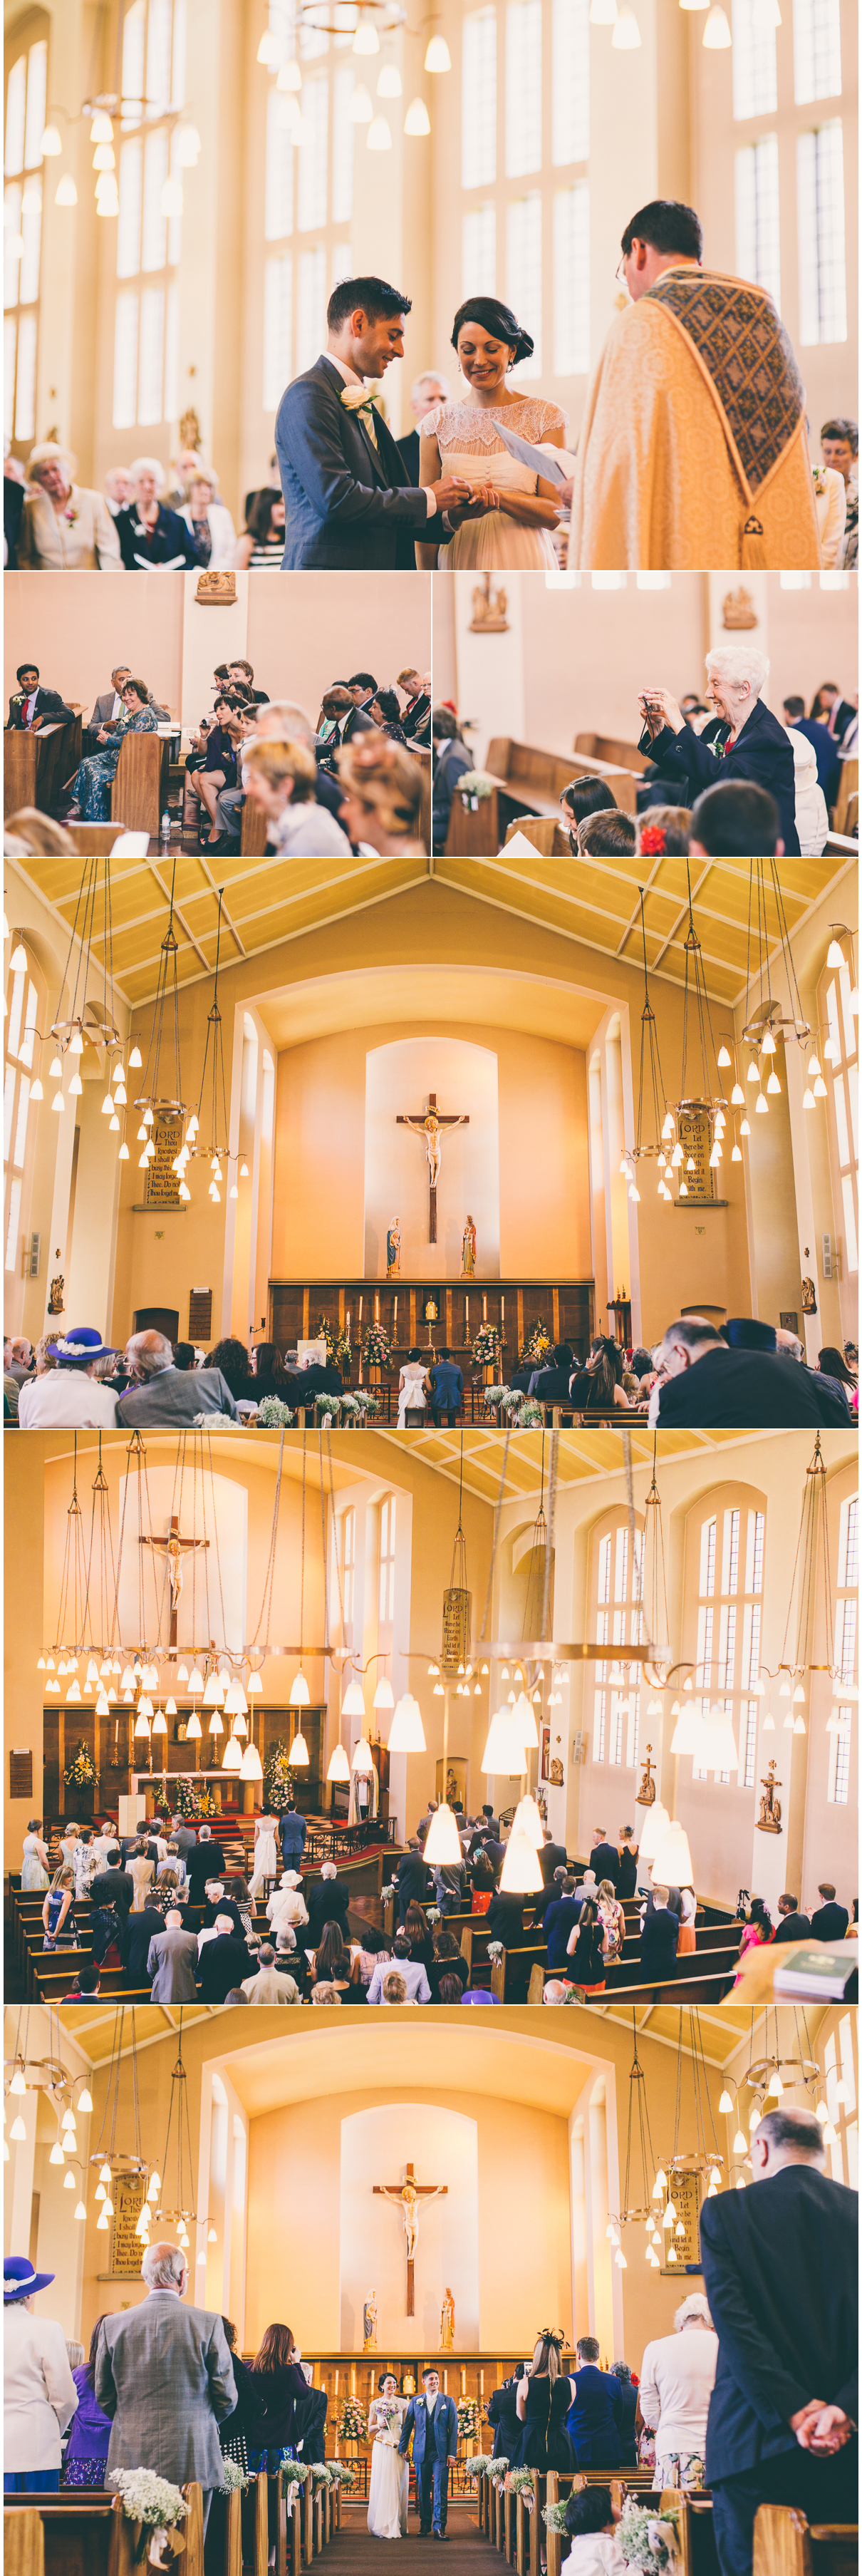 Neil_Jackson_Photographic_Scarborough_York_Yorkshire_Wedding_Photographer_Julie_Jon_Black_Swan_Helmsley_Wedding_Shoot_Blog5